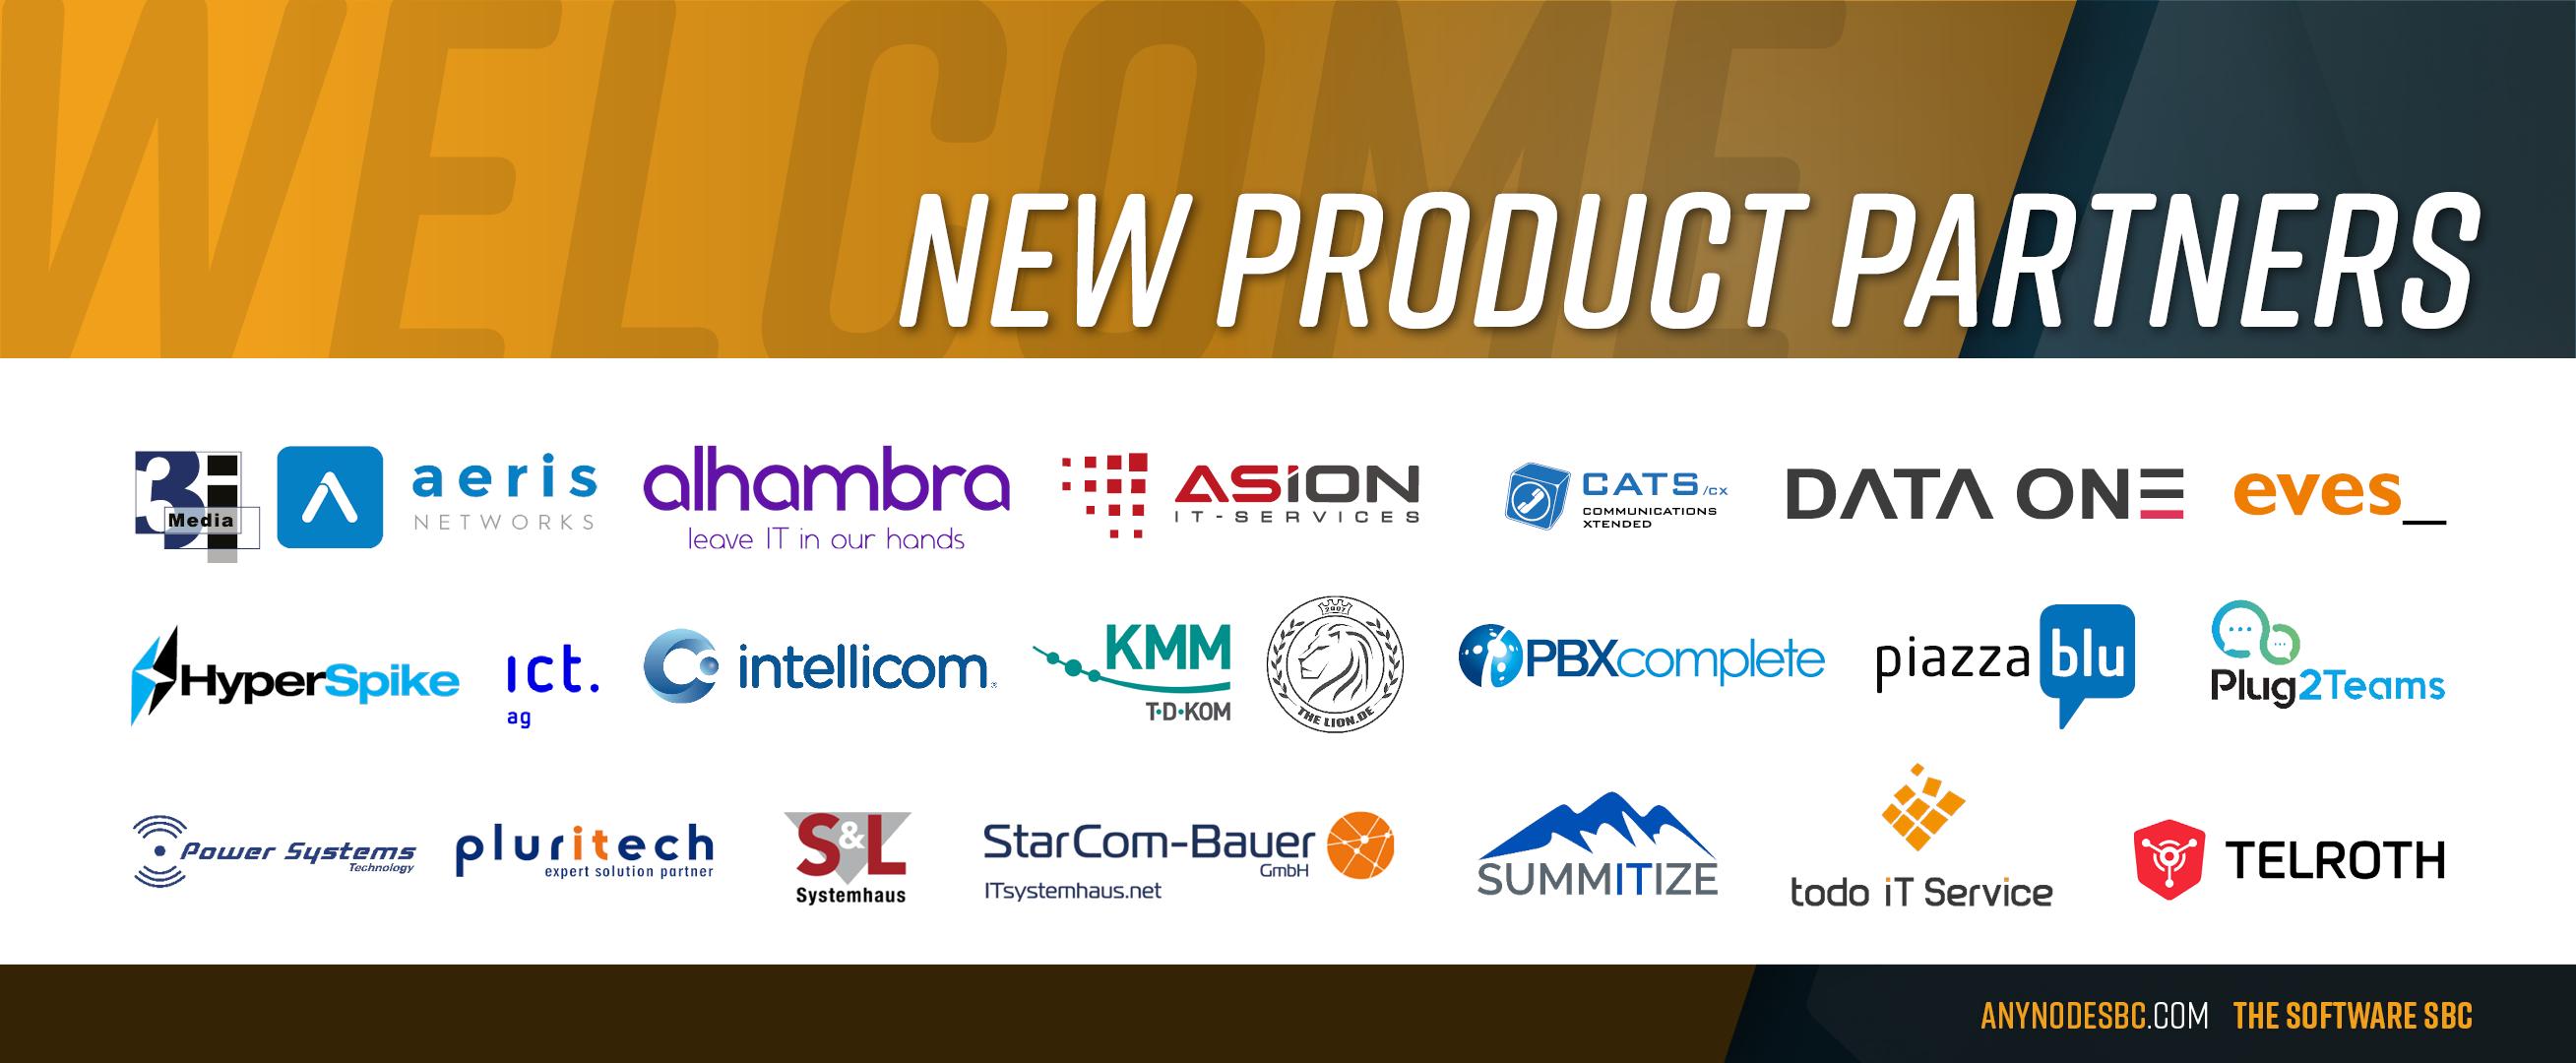 Neue anynode Produktpartner im Juli 2020!